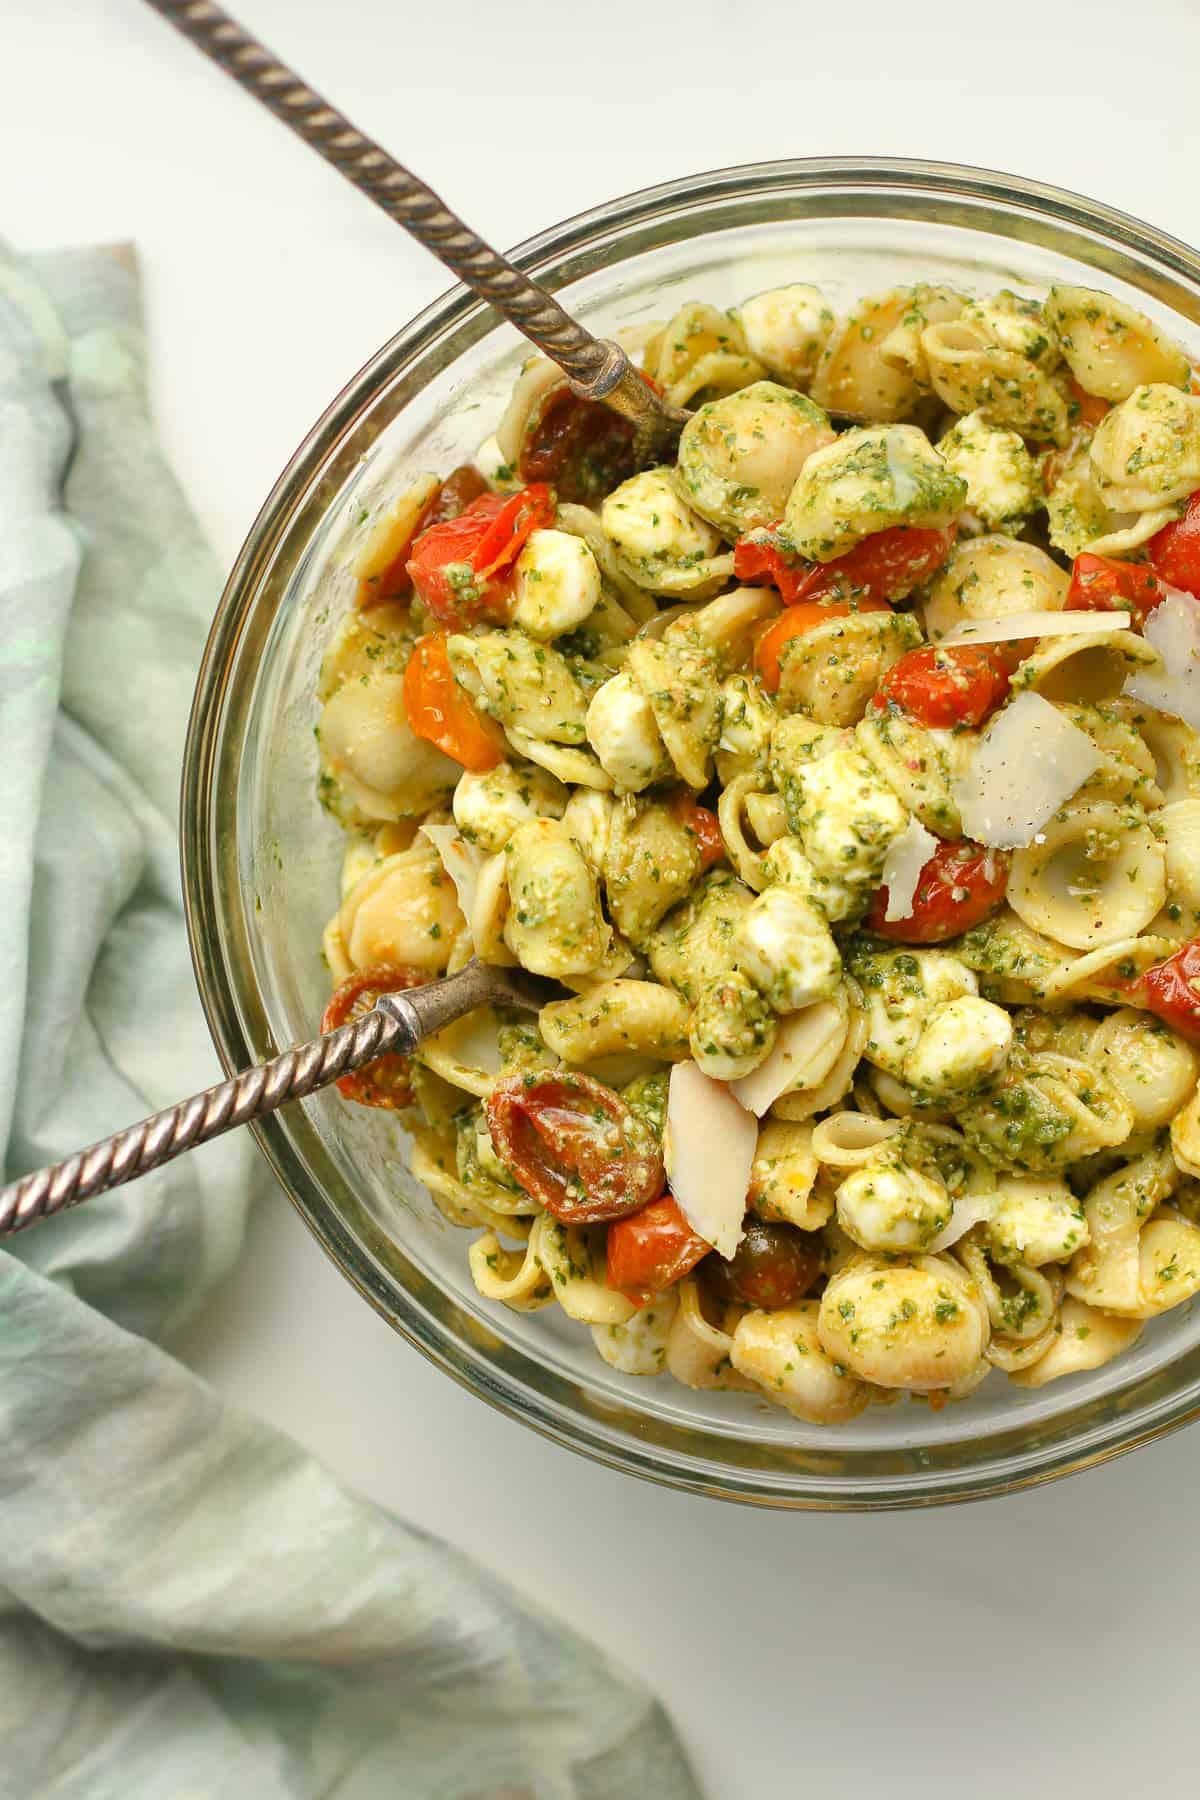 A bowl of pesto pasta salad.